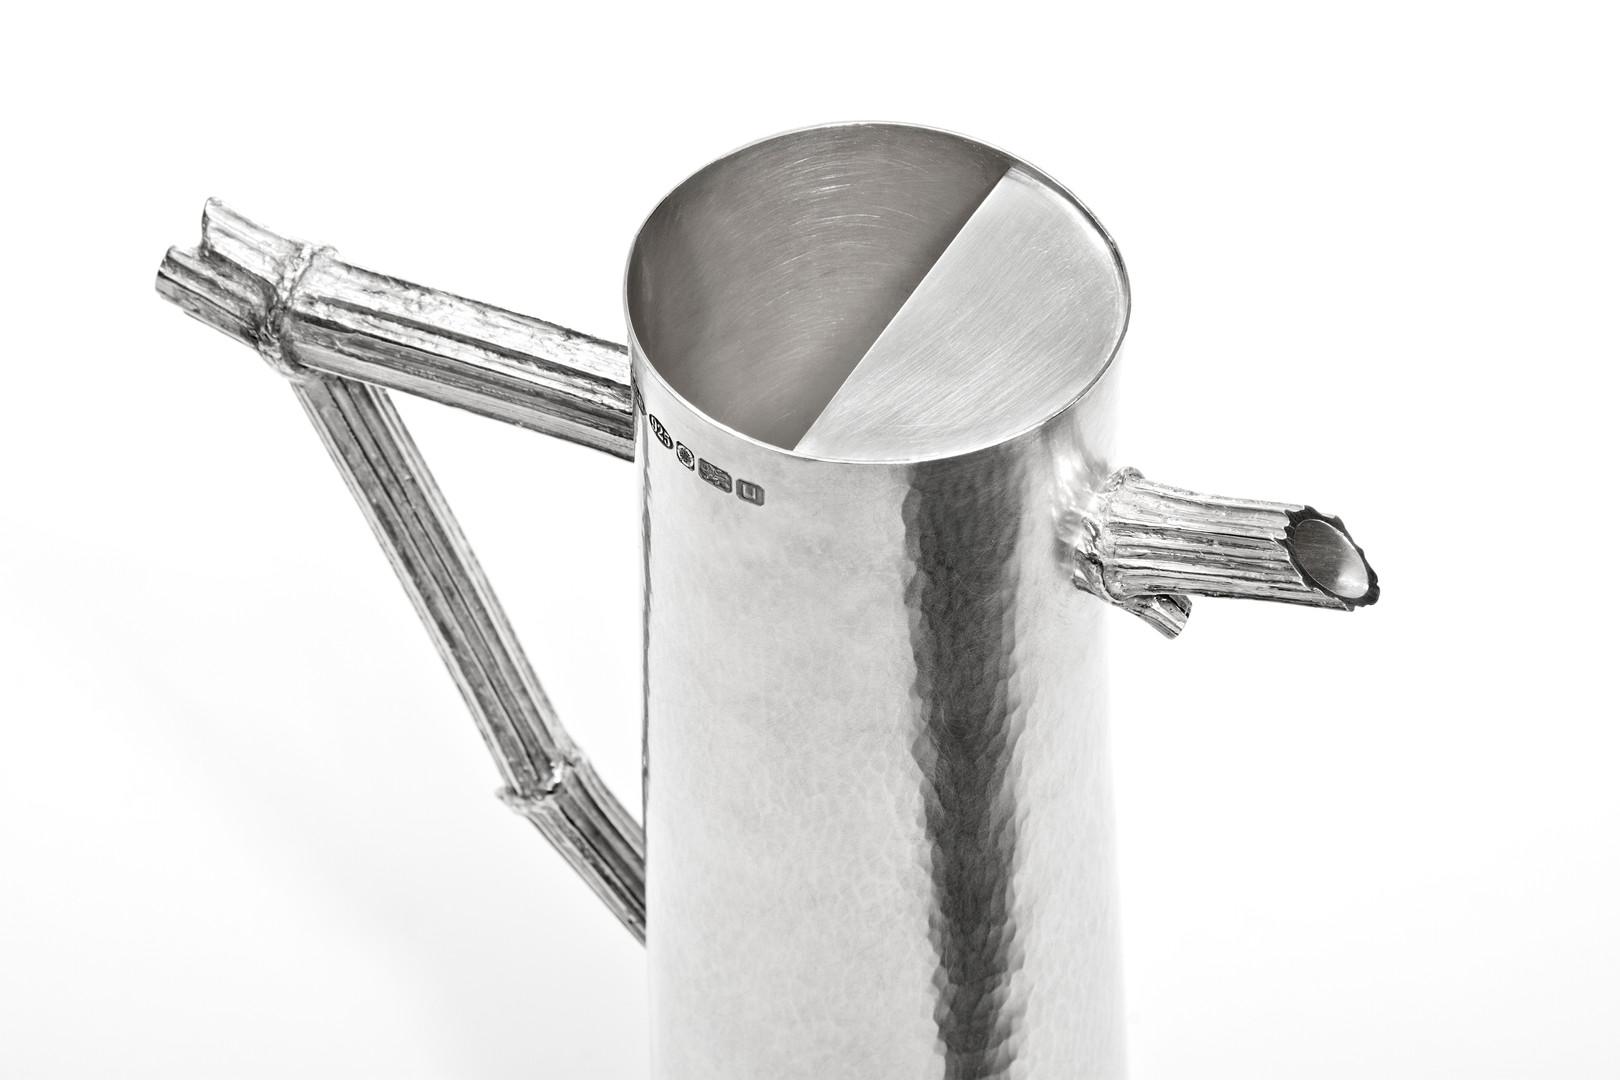 Sterling Silver Jug, 2018